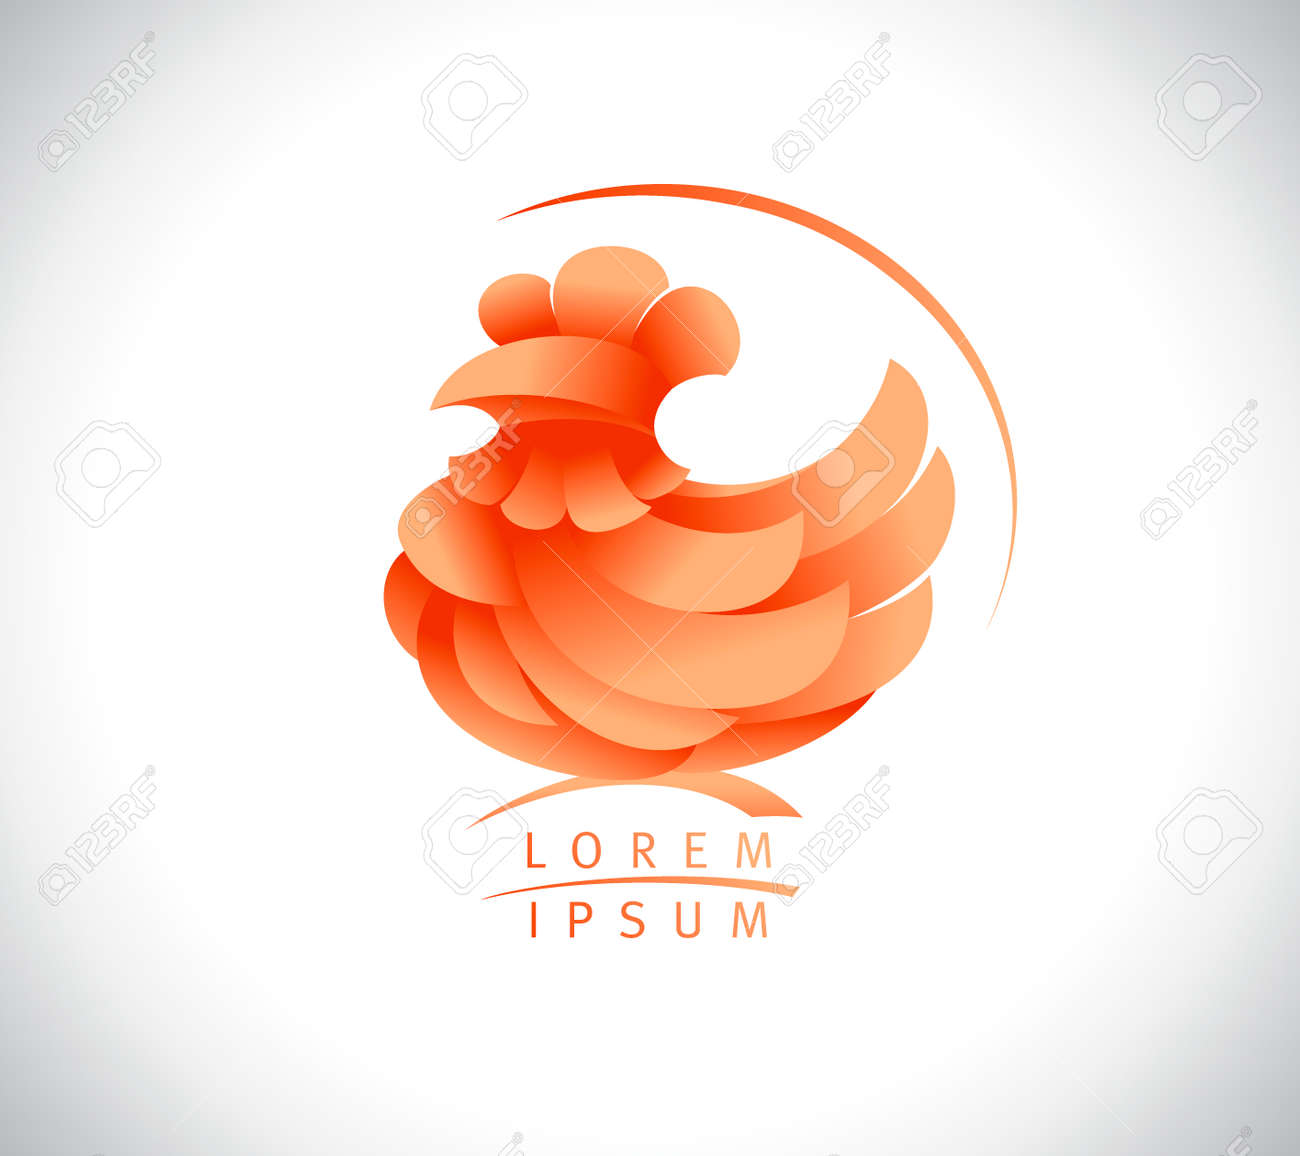 Hen or rooster vector logo concept - 108574694